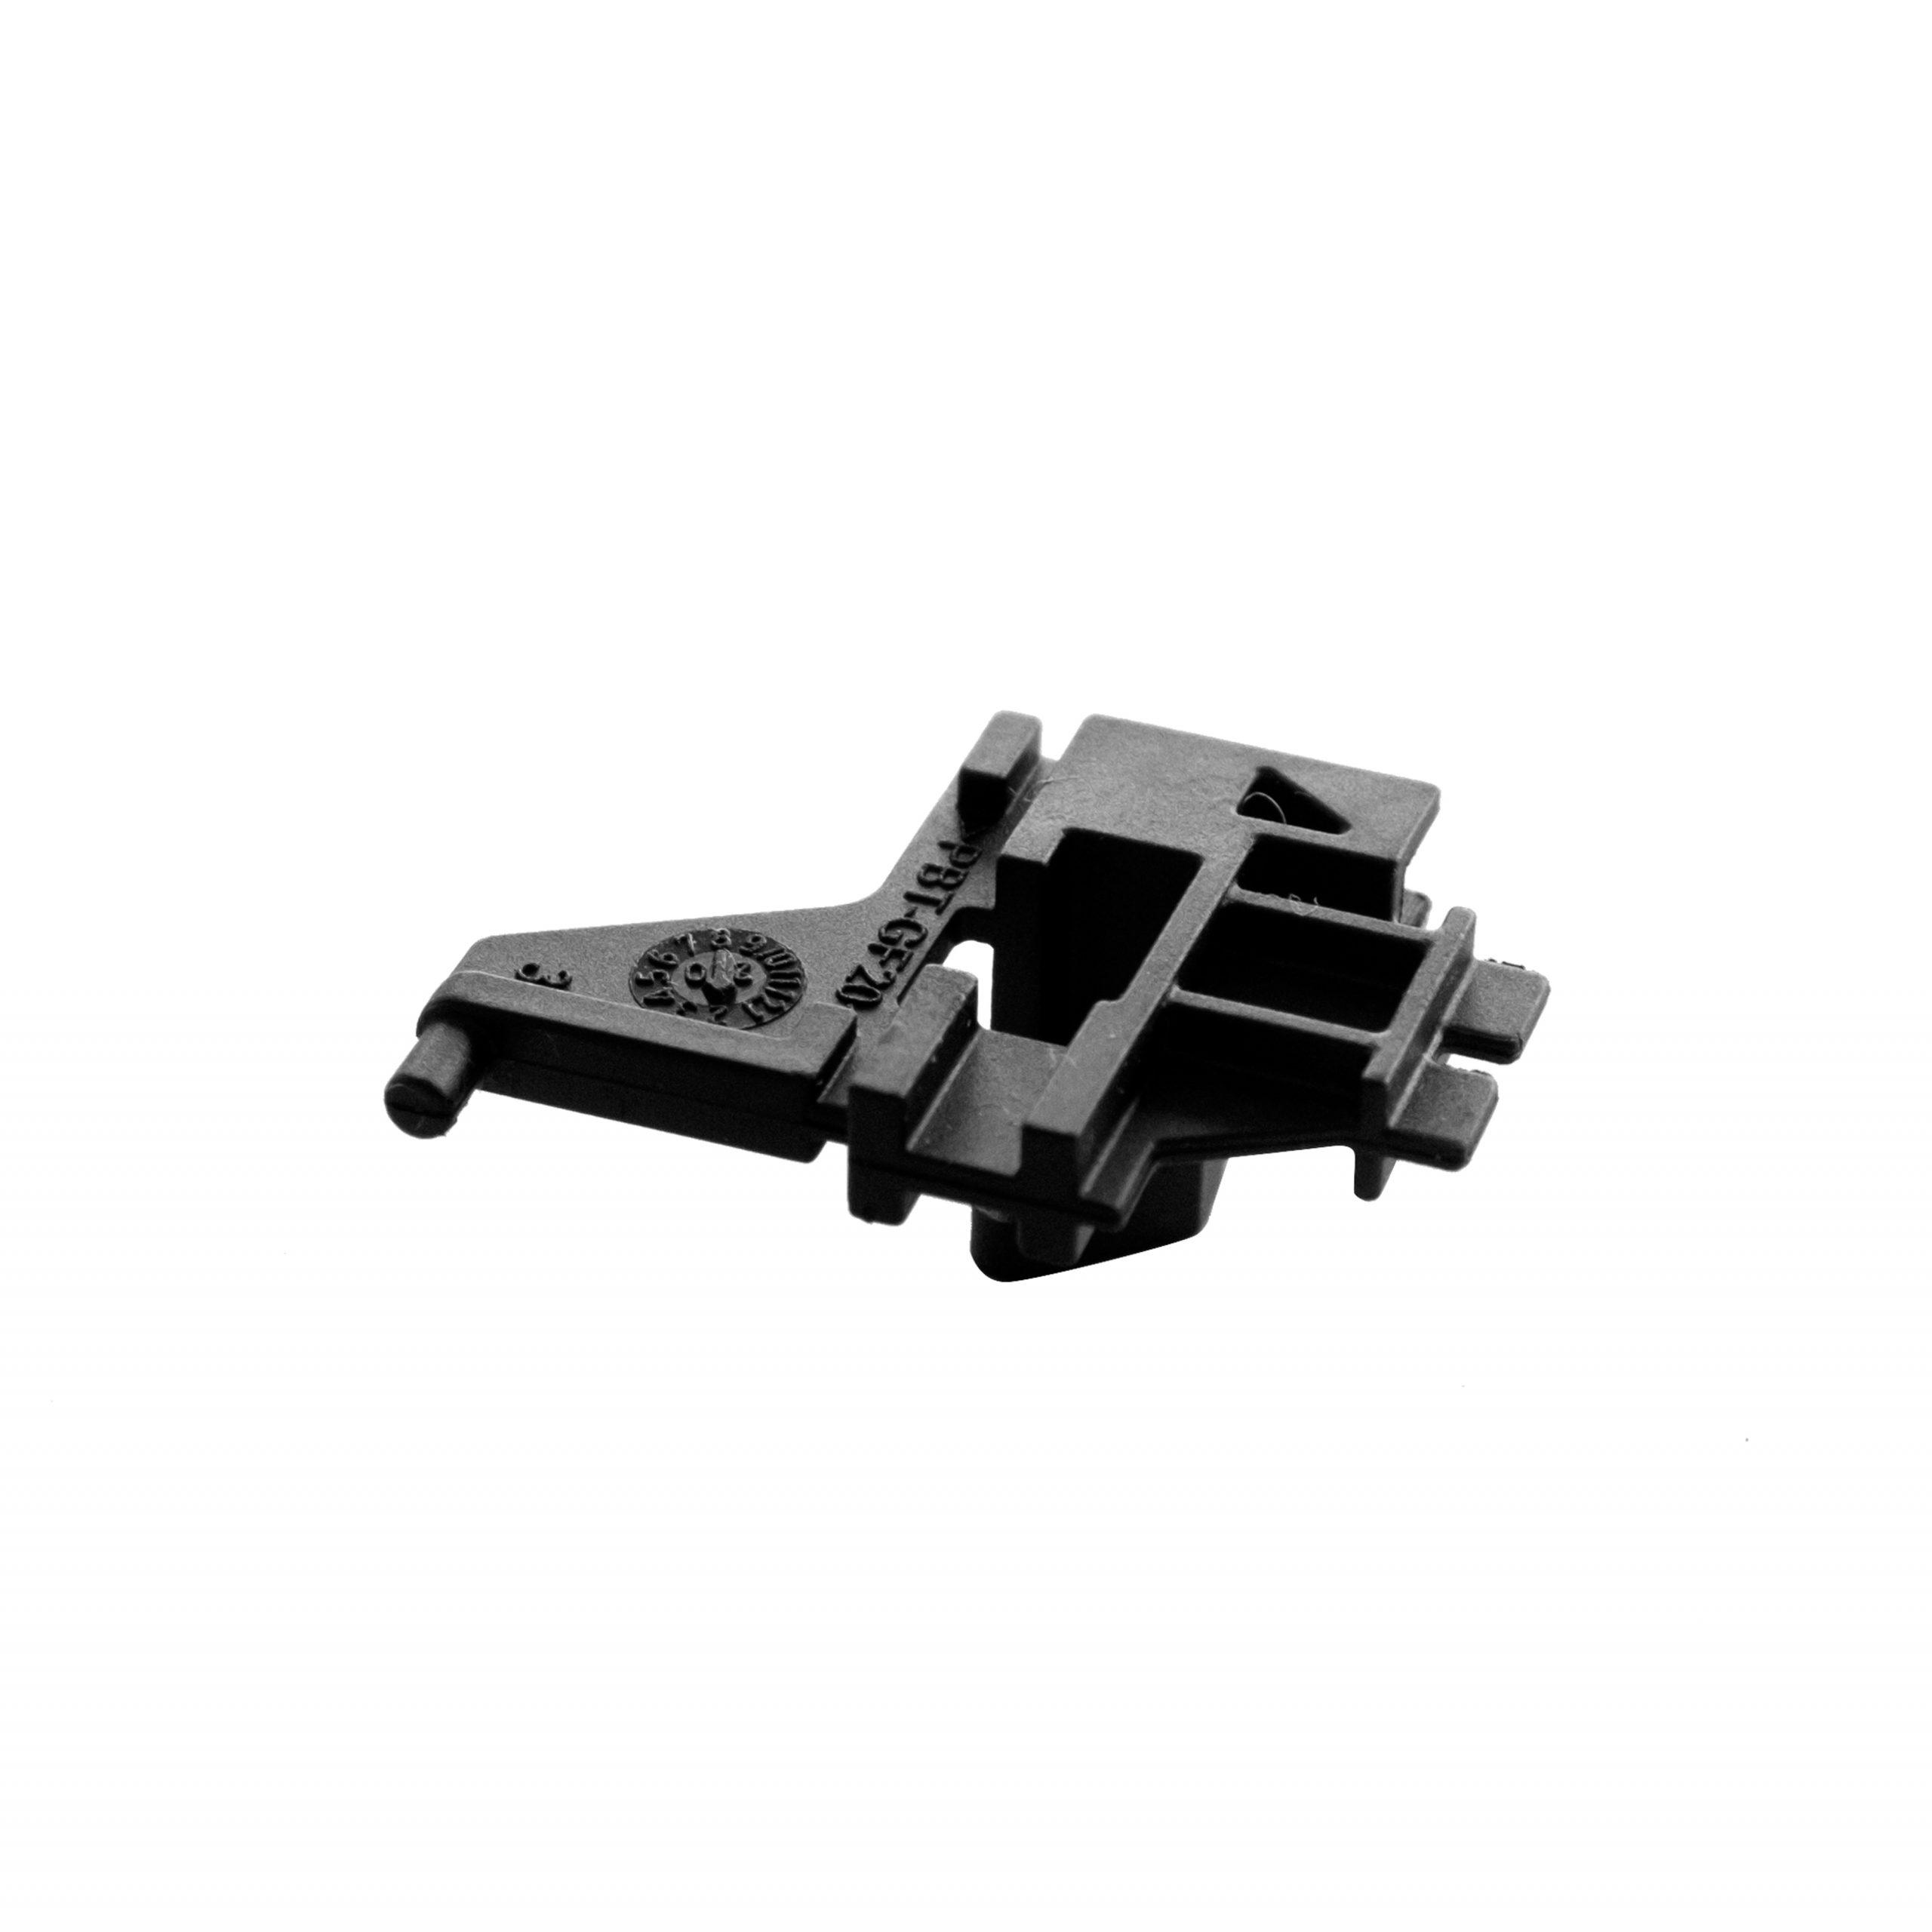 inovamolde-moldes-tecnicos-automovel-4